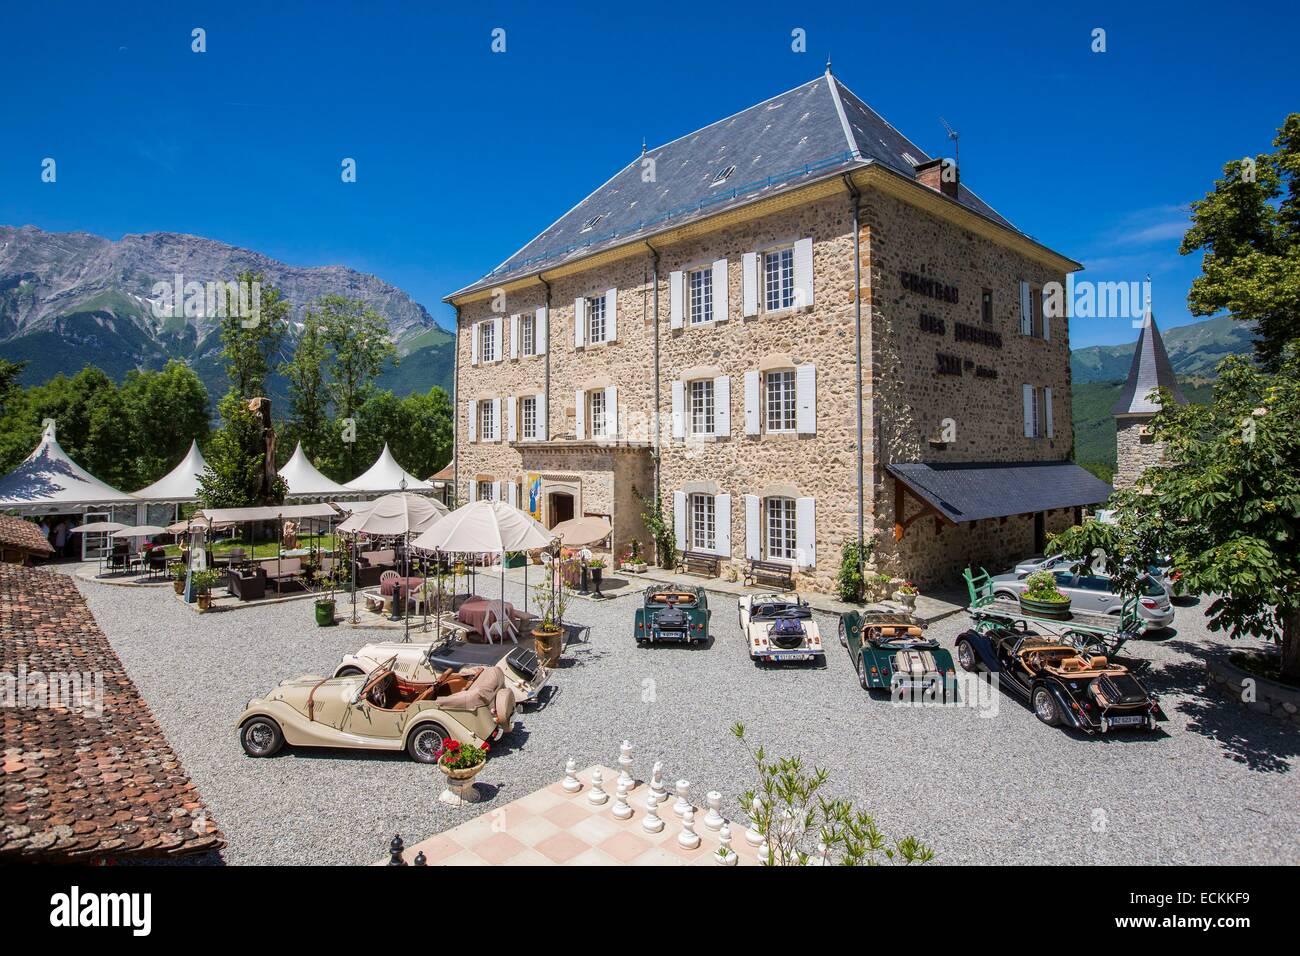 Hotel Restaurant Hautes Alpes